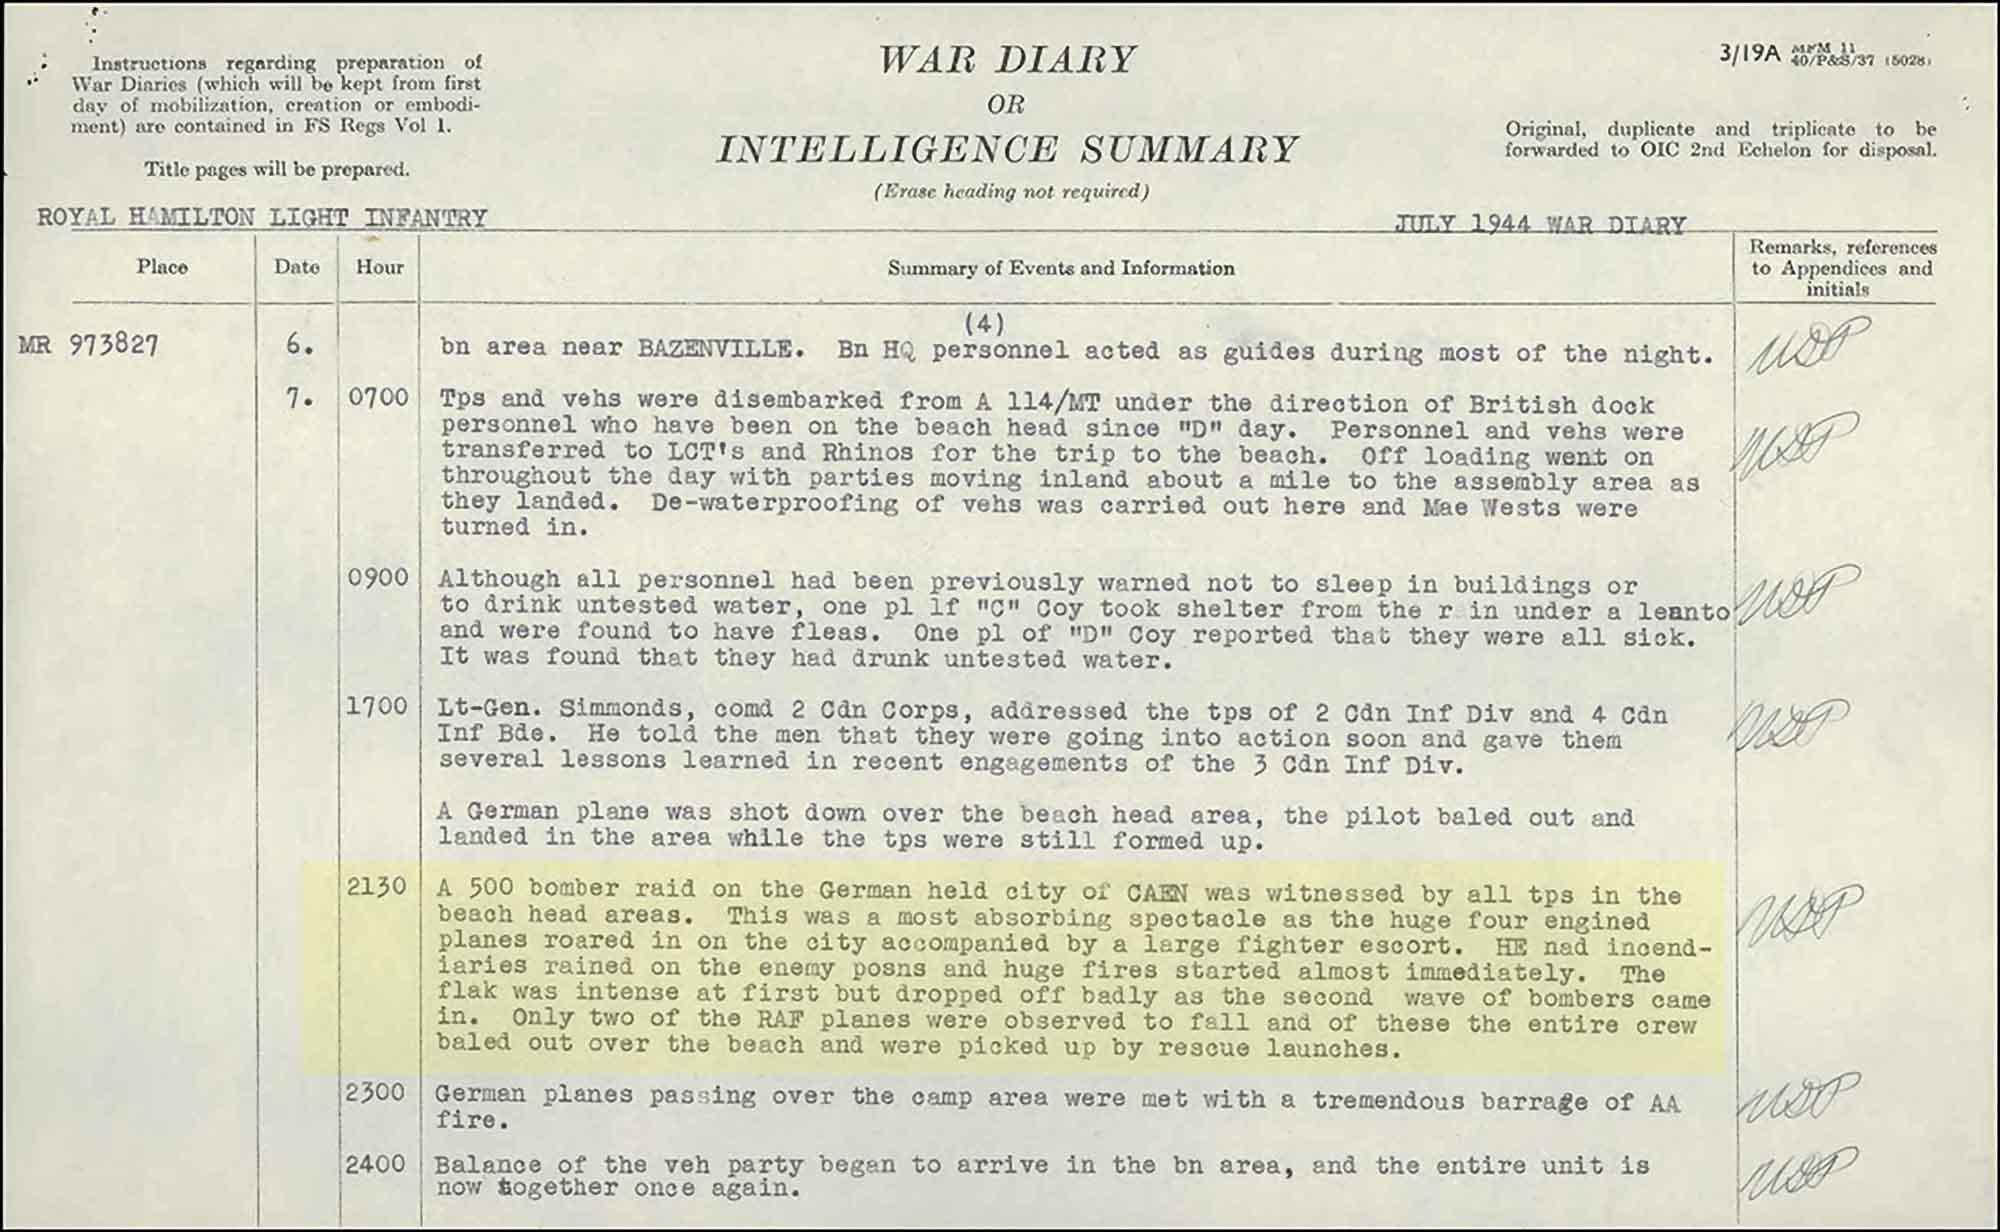 War Diaries - Royal Hamilton Light Infantry